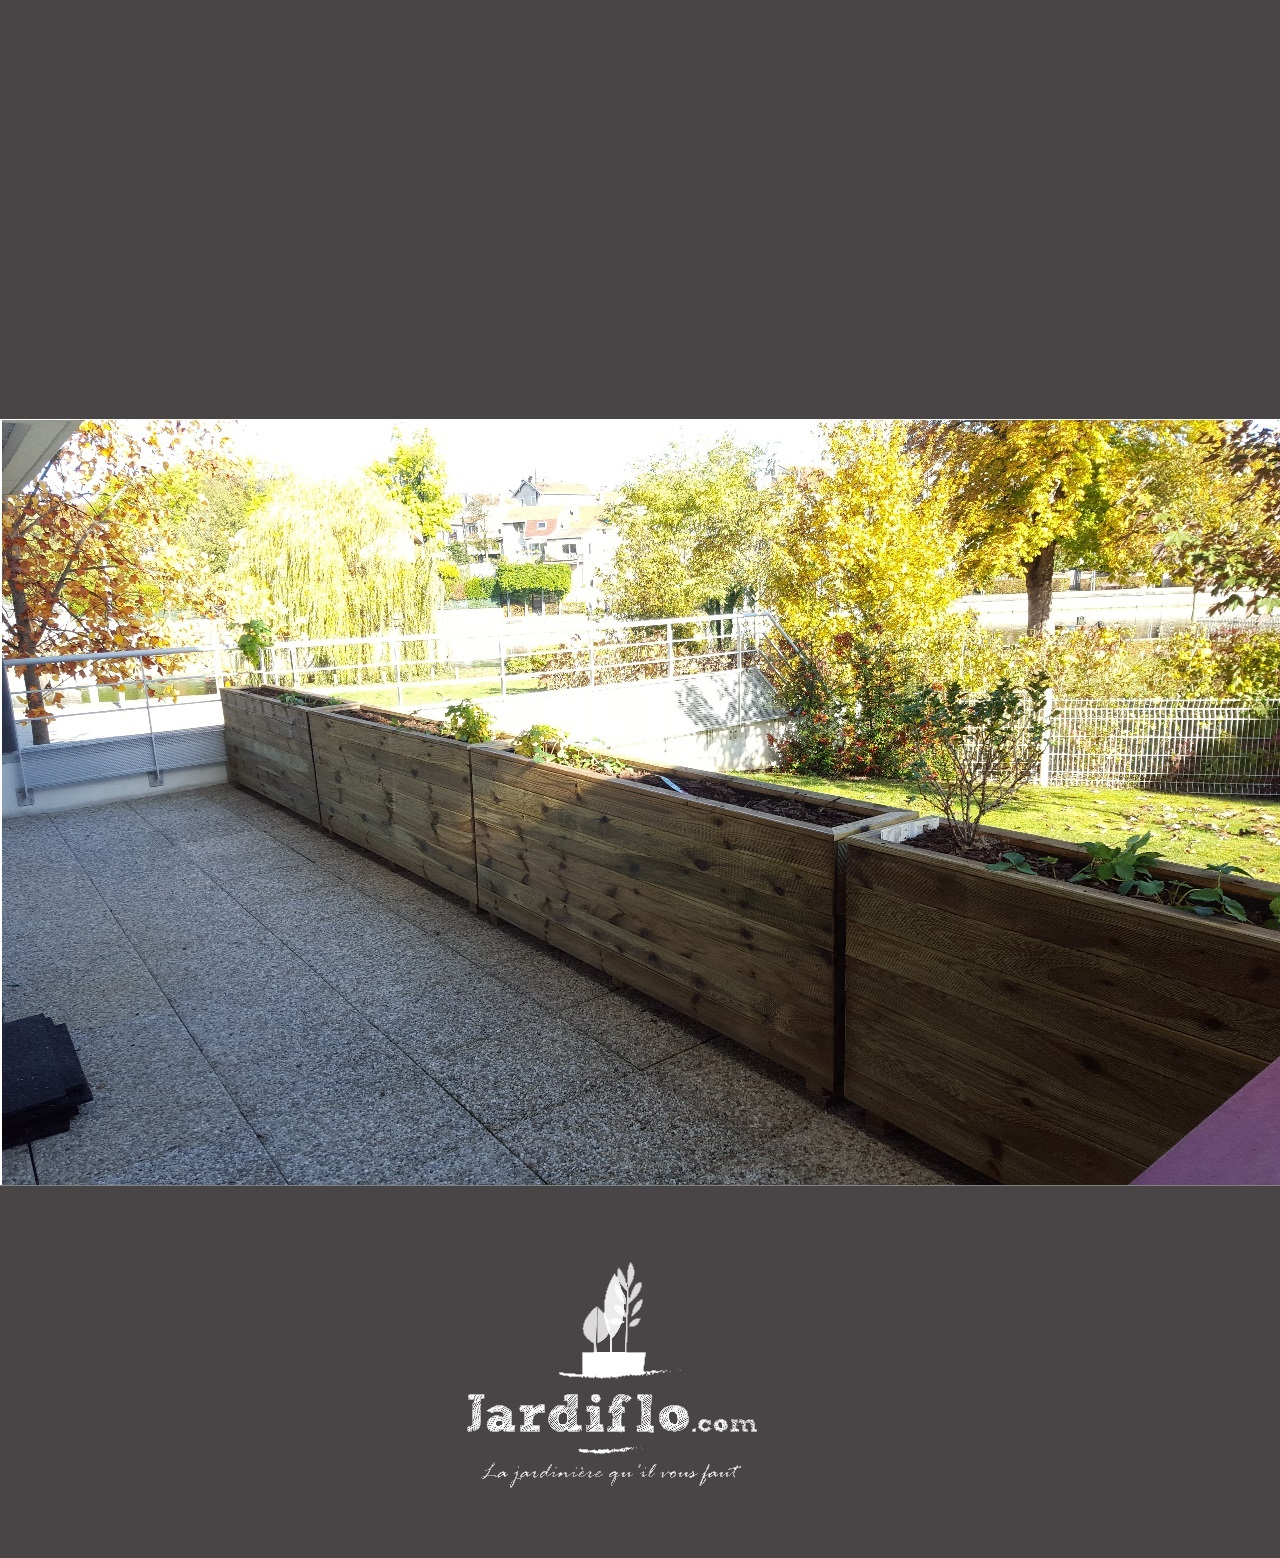 Jardini re 200x35x70 320l standard jardini re rectangulaire jardini re xxl en bois certifi - Jardiniere xxl ...